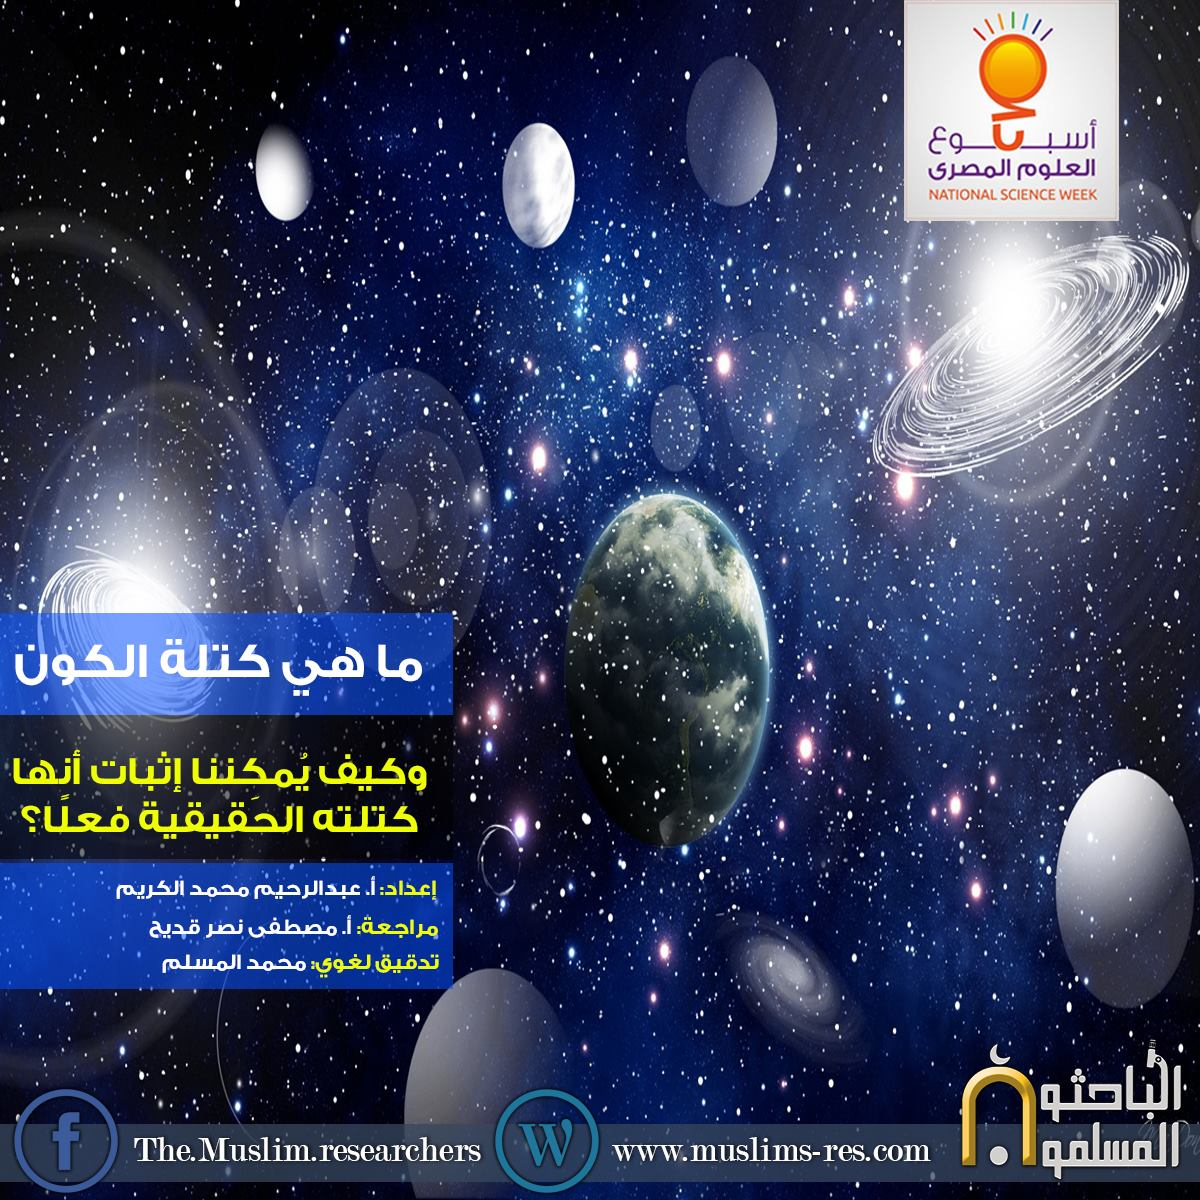 12030451_577573869071138_174822522455342628_o